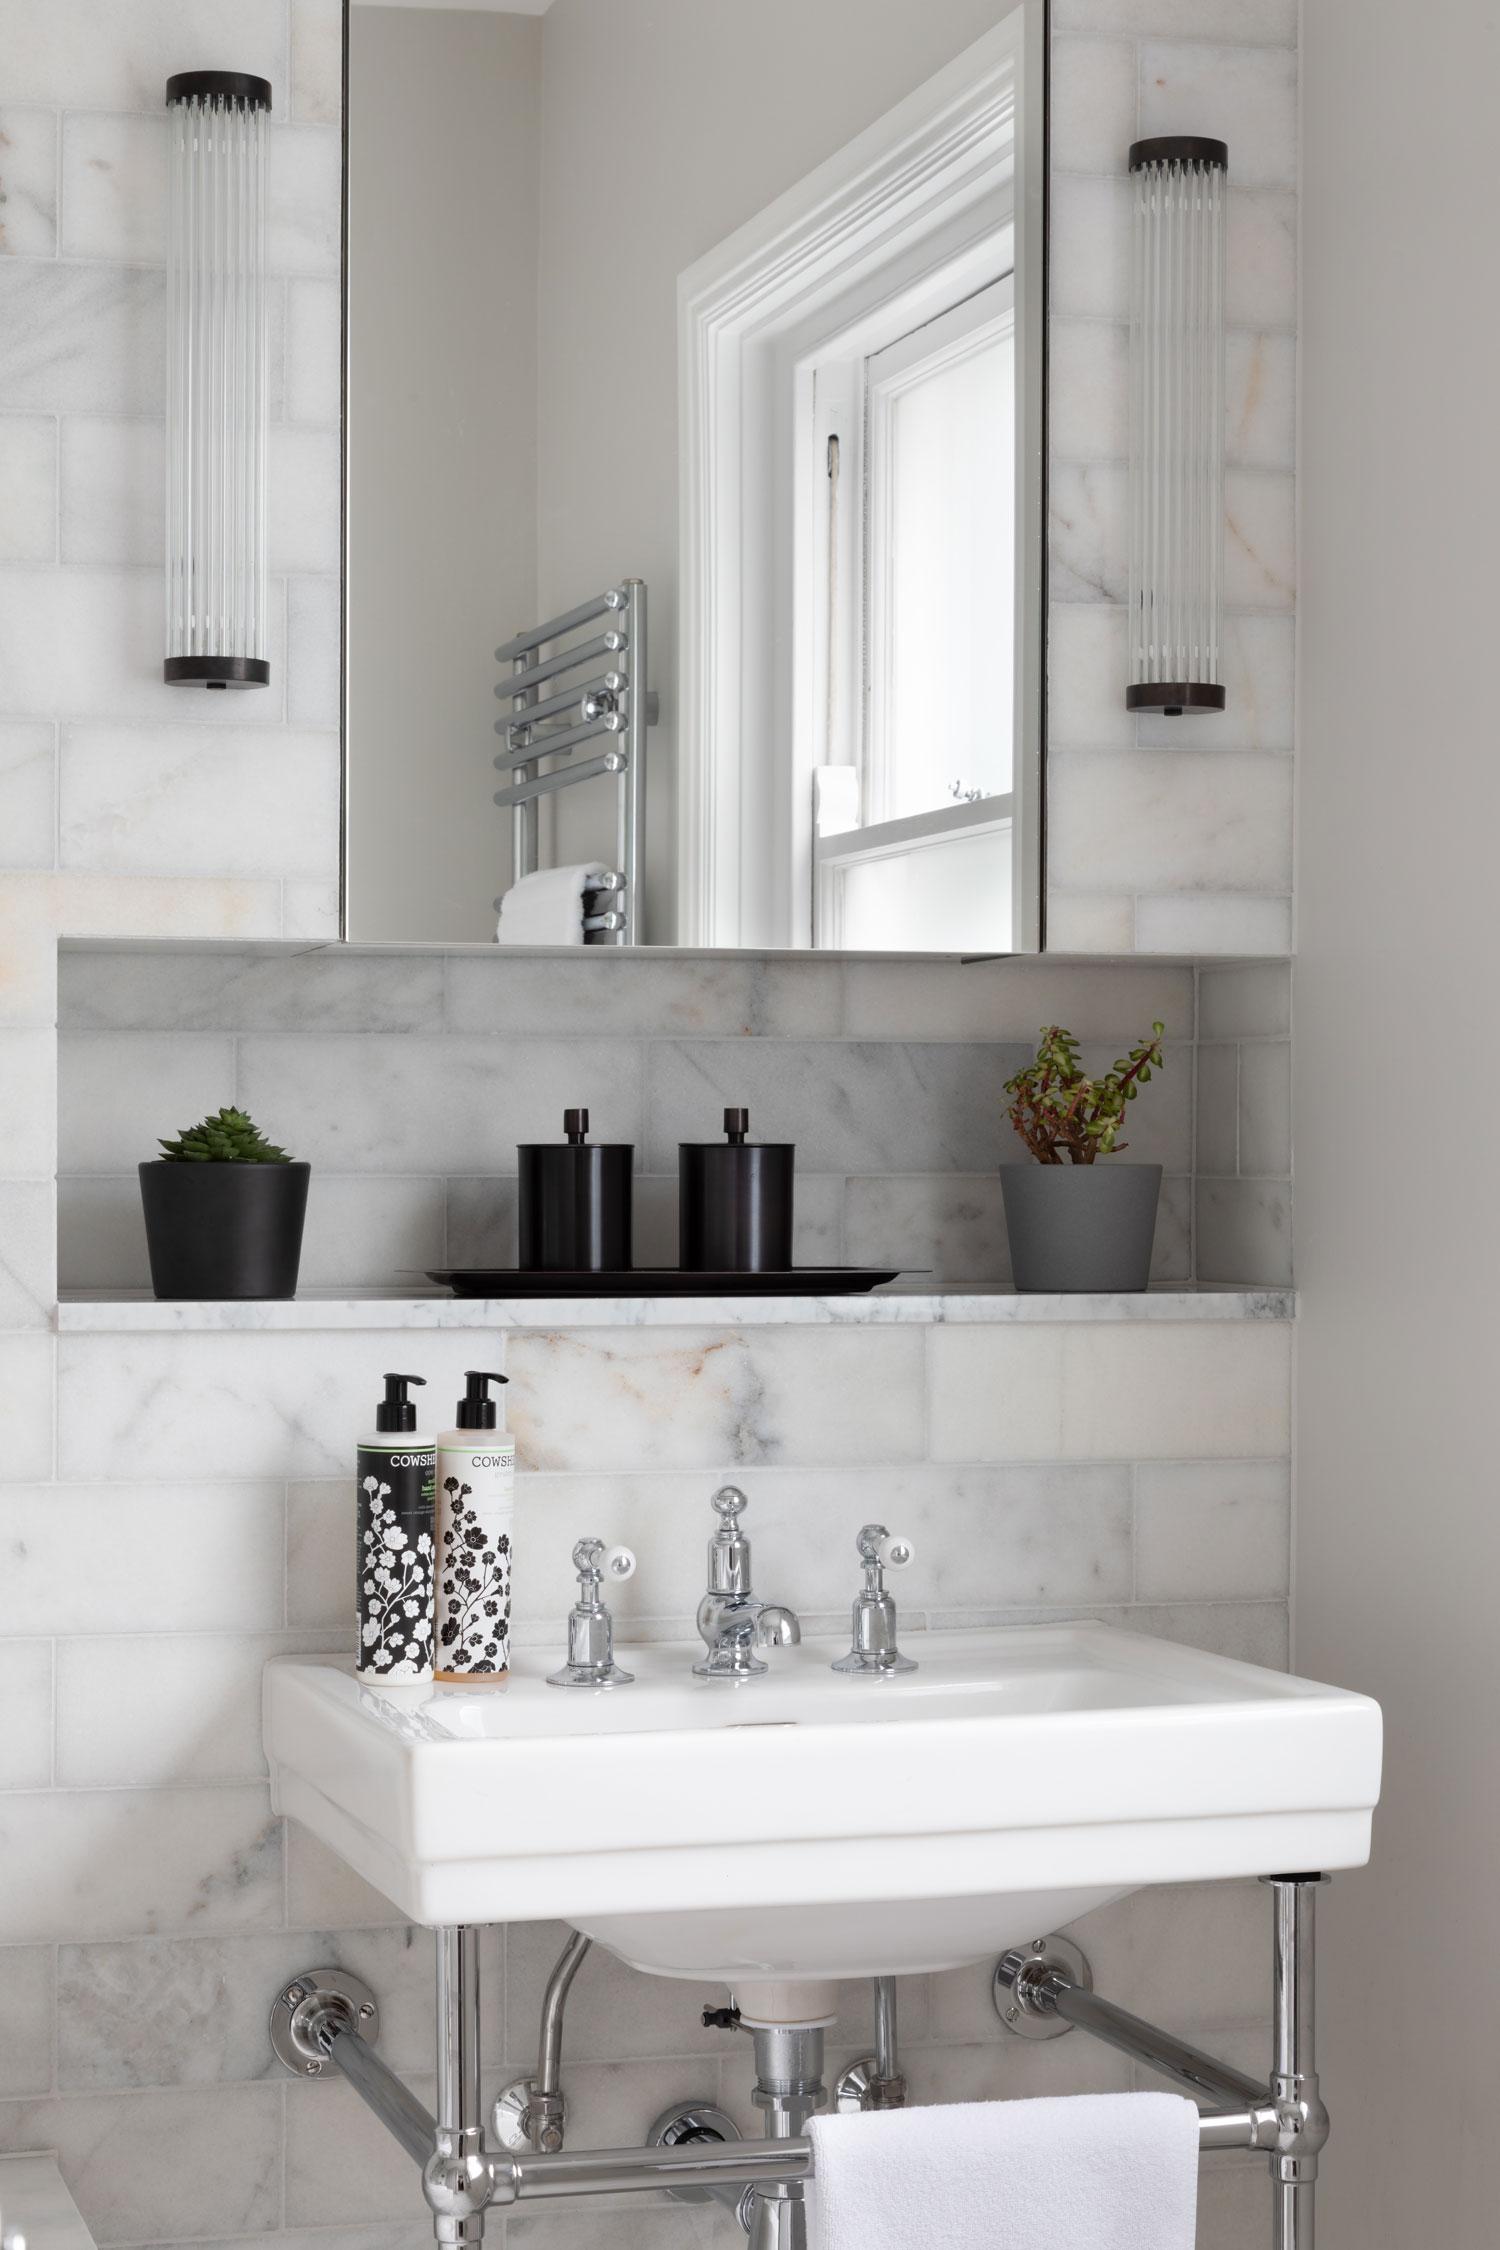 Shaw Loft bathroom – 23